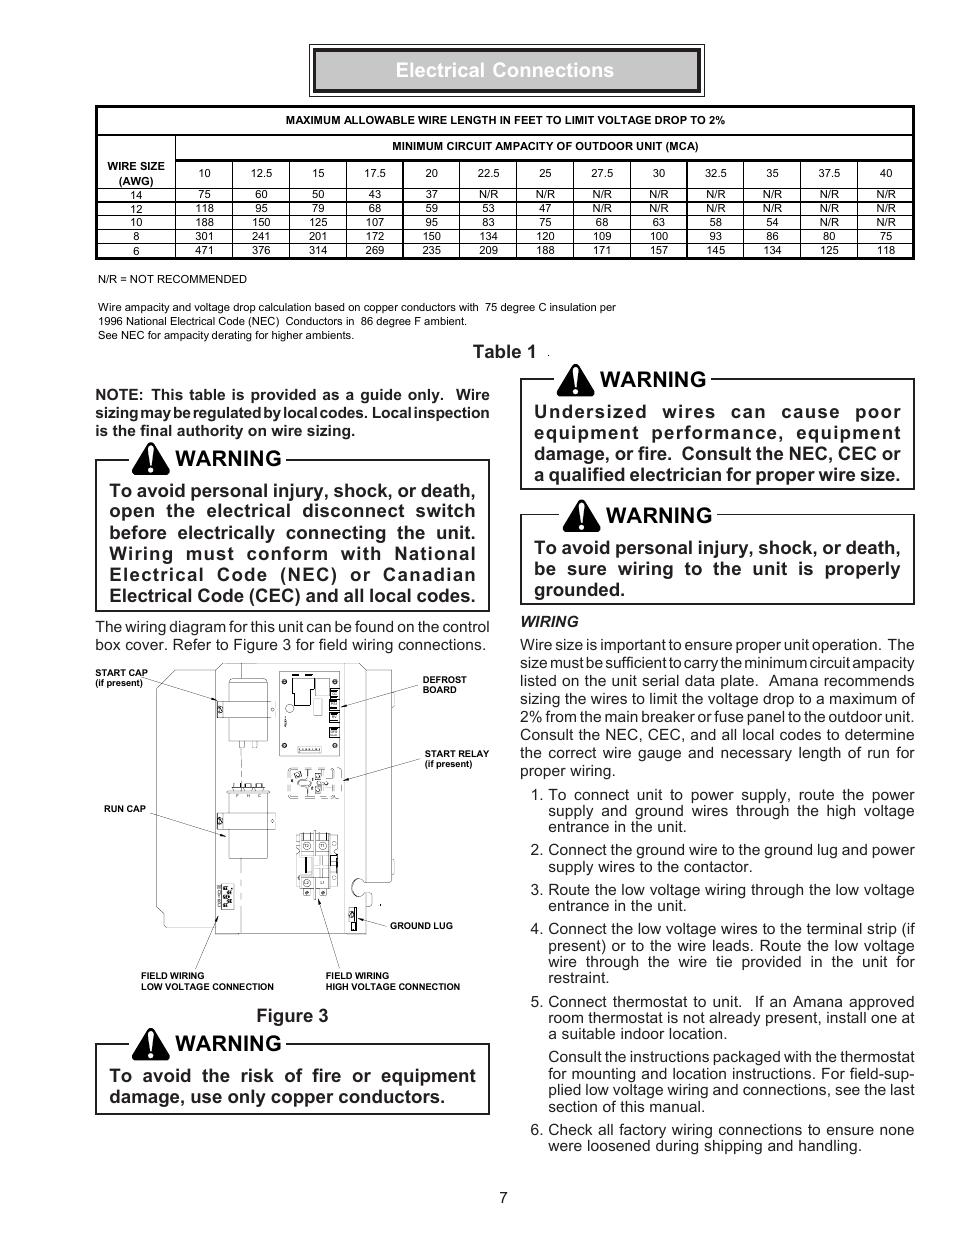 electrical connections, wiring, warning | goodman mfg amana remote on  hvac heat pump diagram